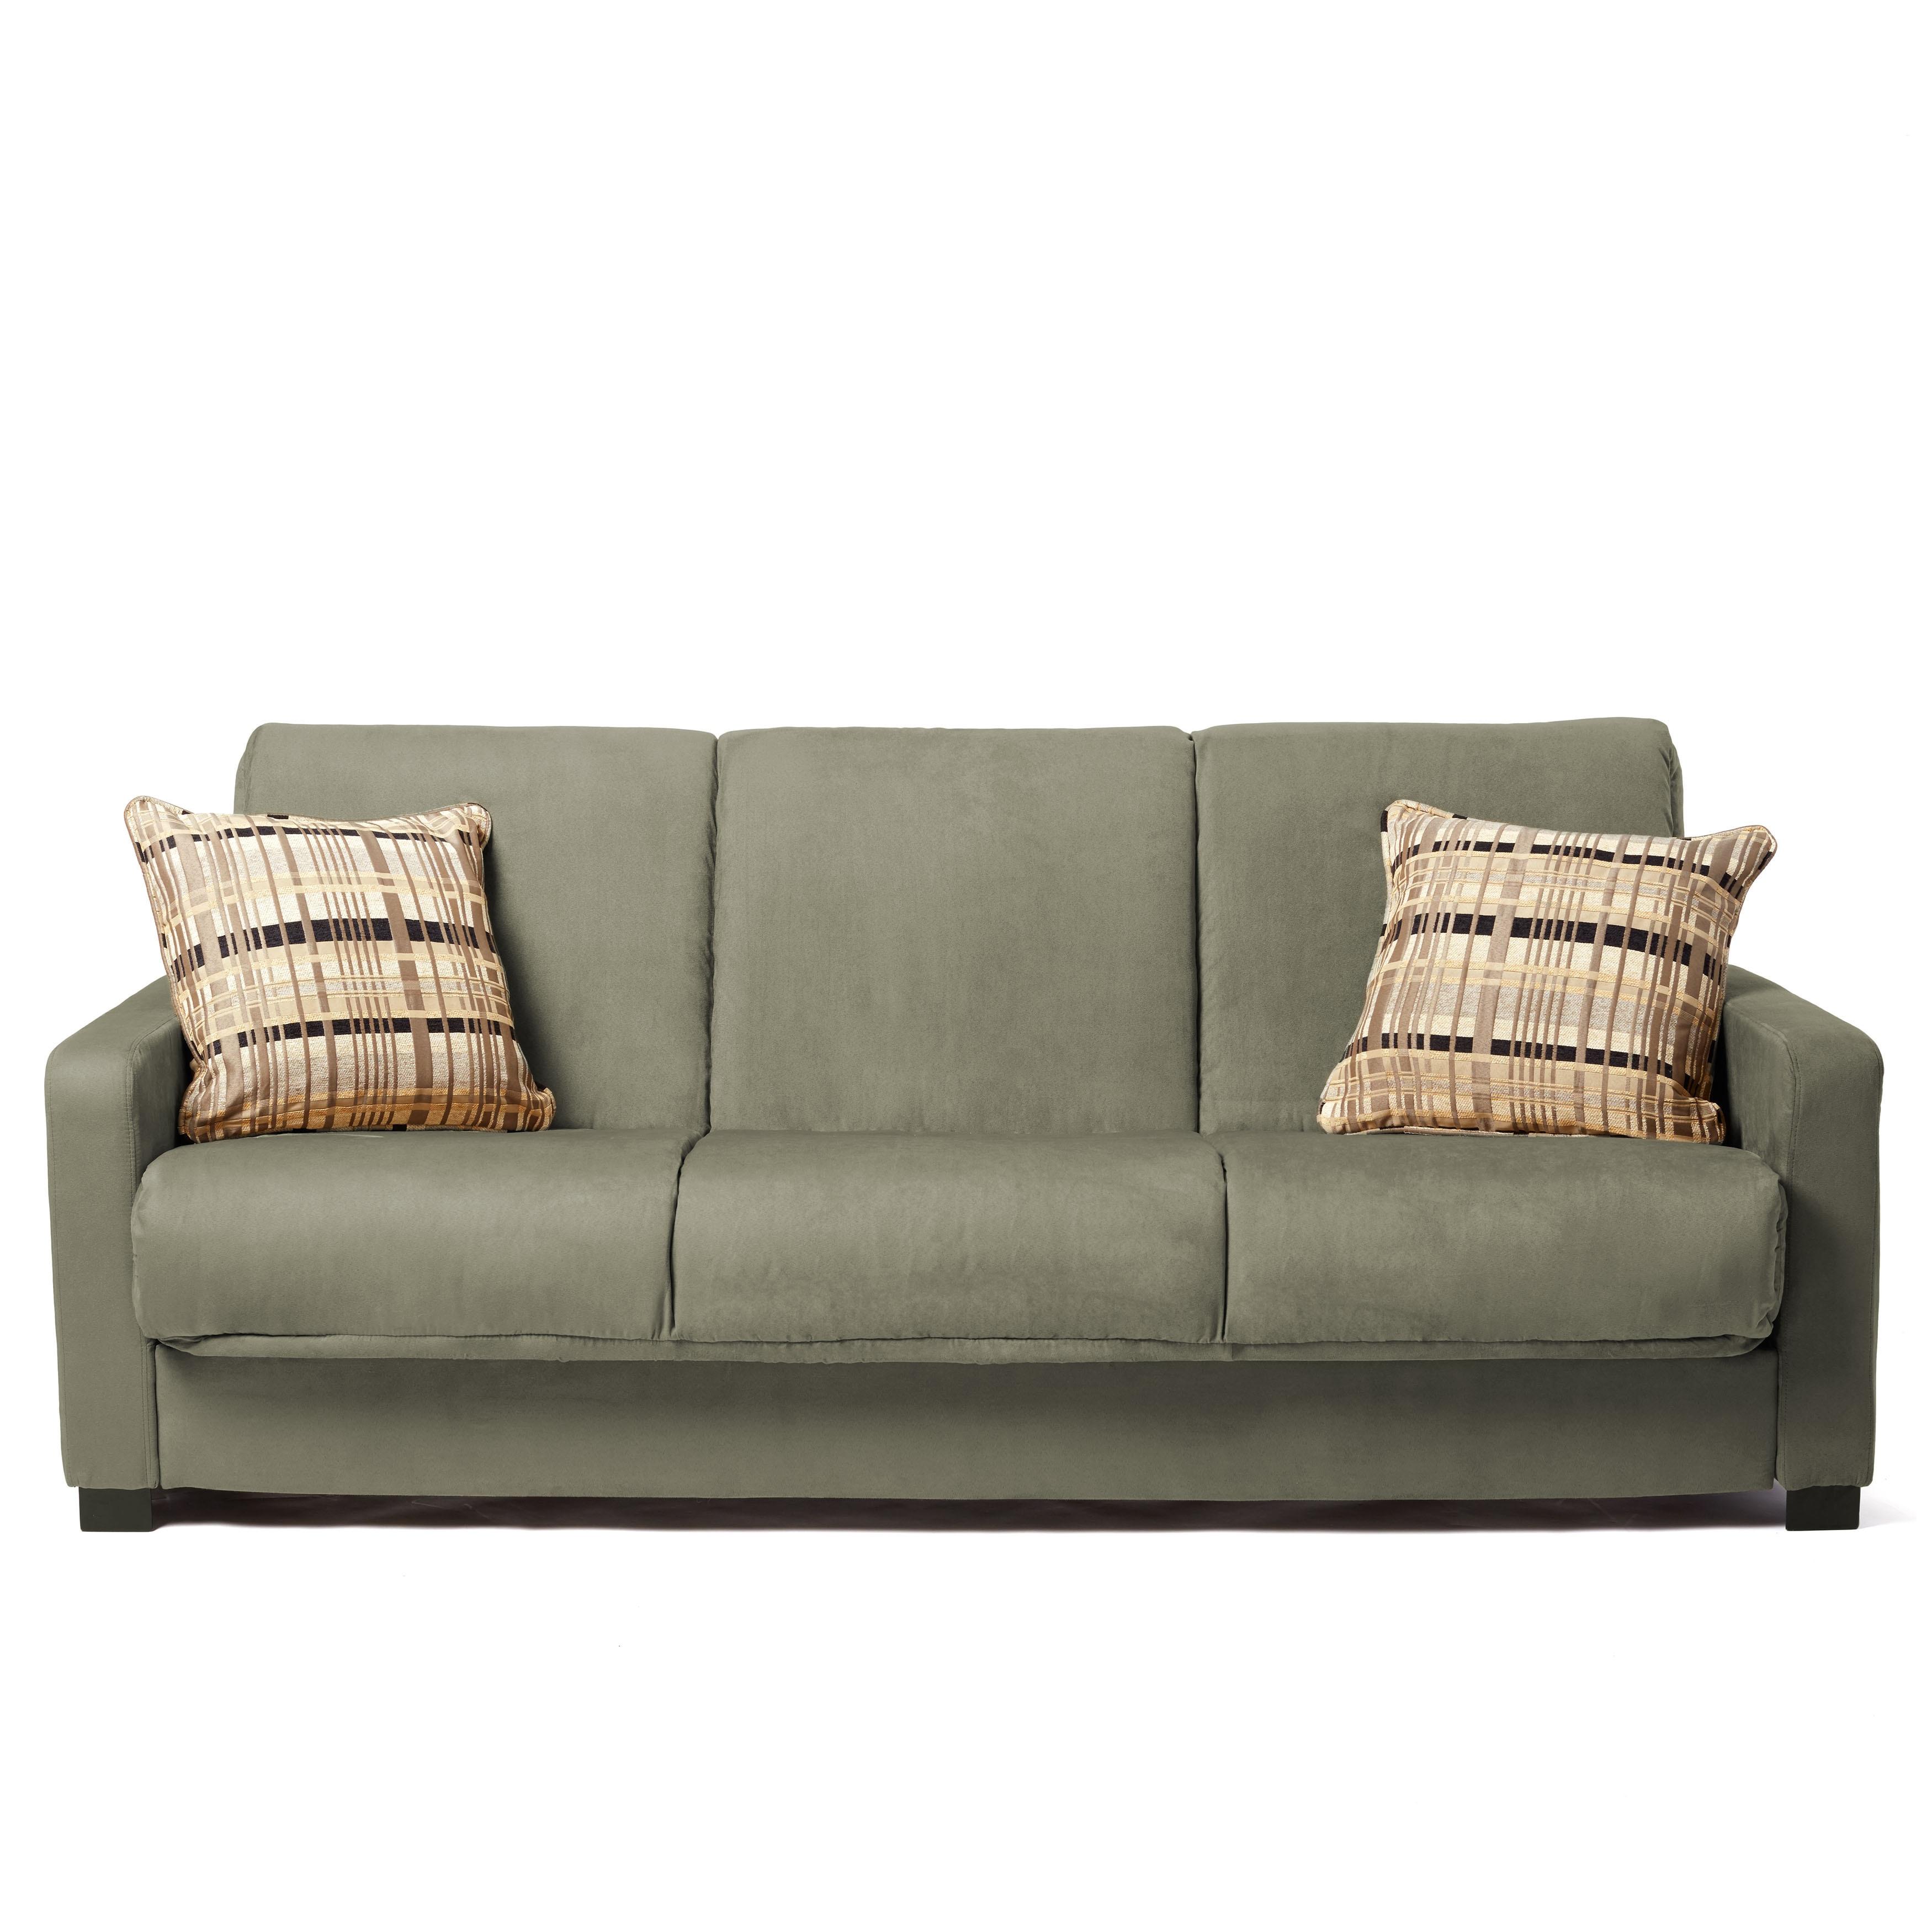 Handy Living Trace ConvertaCouch Sage Grey Microfiber Futon Sofa